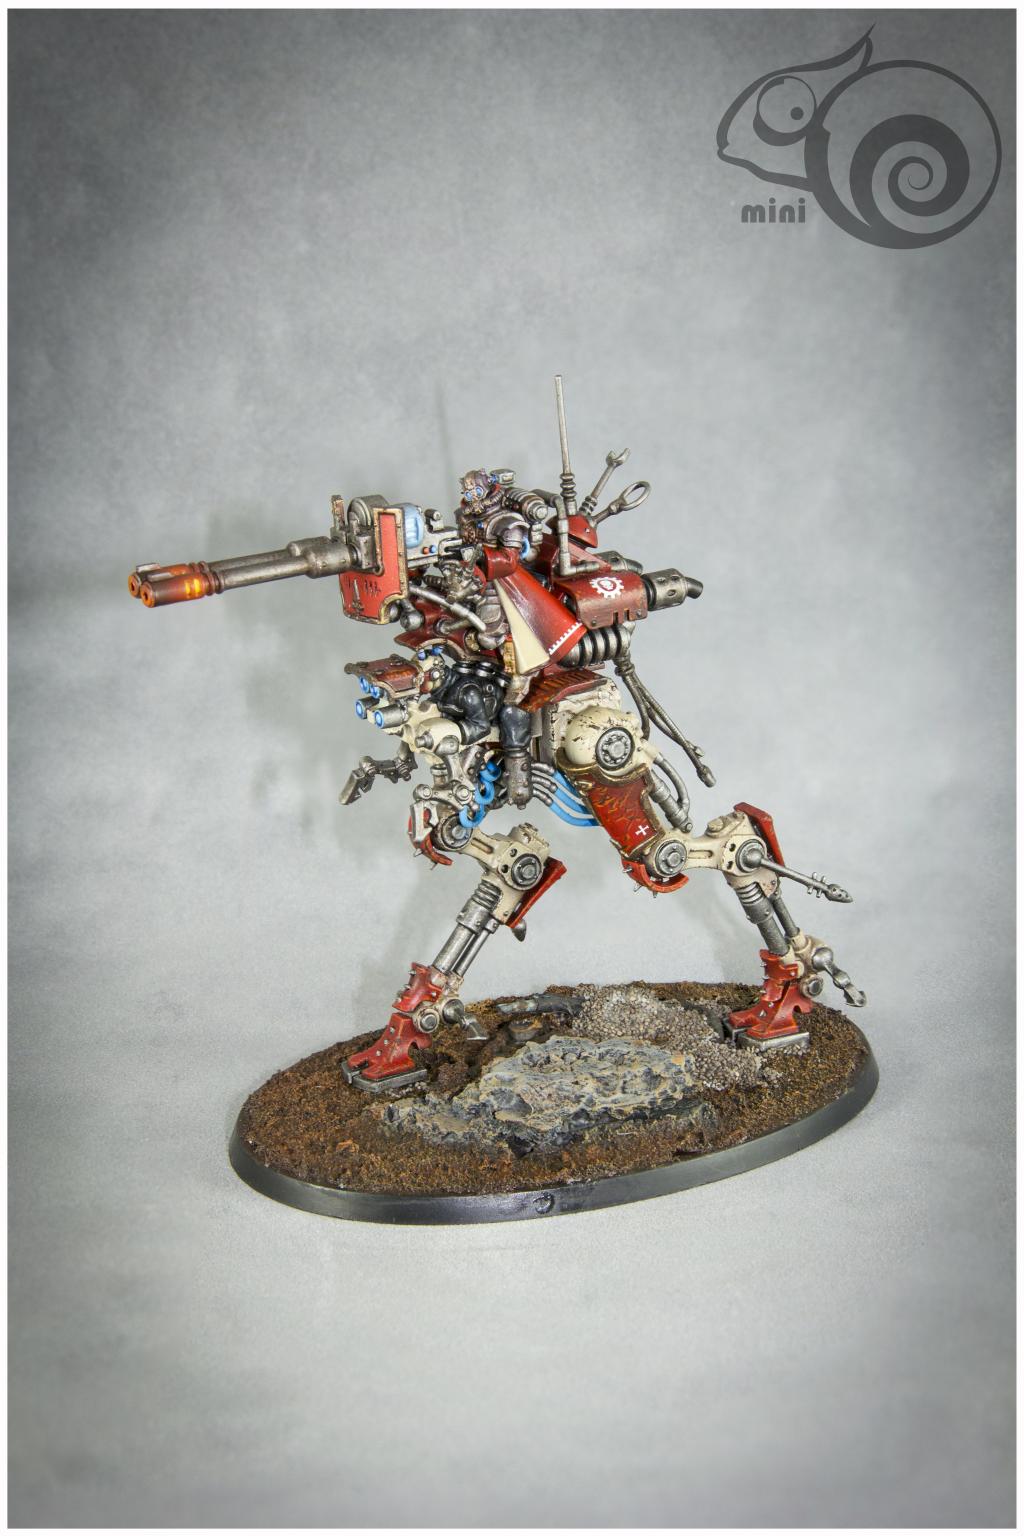 Adeptus Mechanicus, Games Workshop, Ironstrider Ballistarius, Sydonian Dragoon, Warhammer 40,000